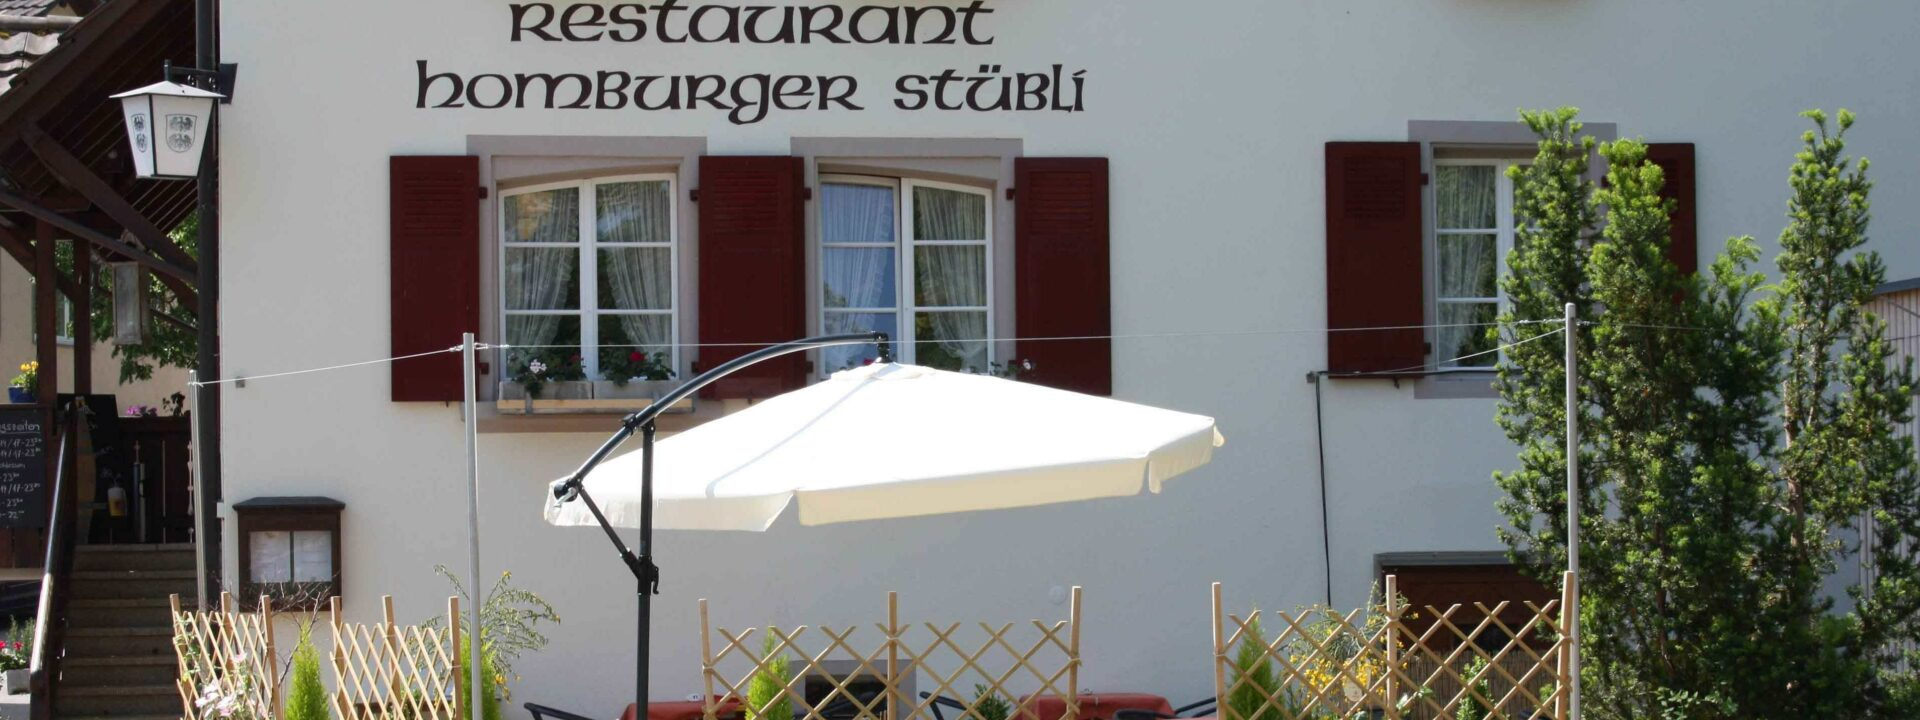 Restaurant Homburgerstübli